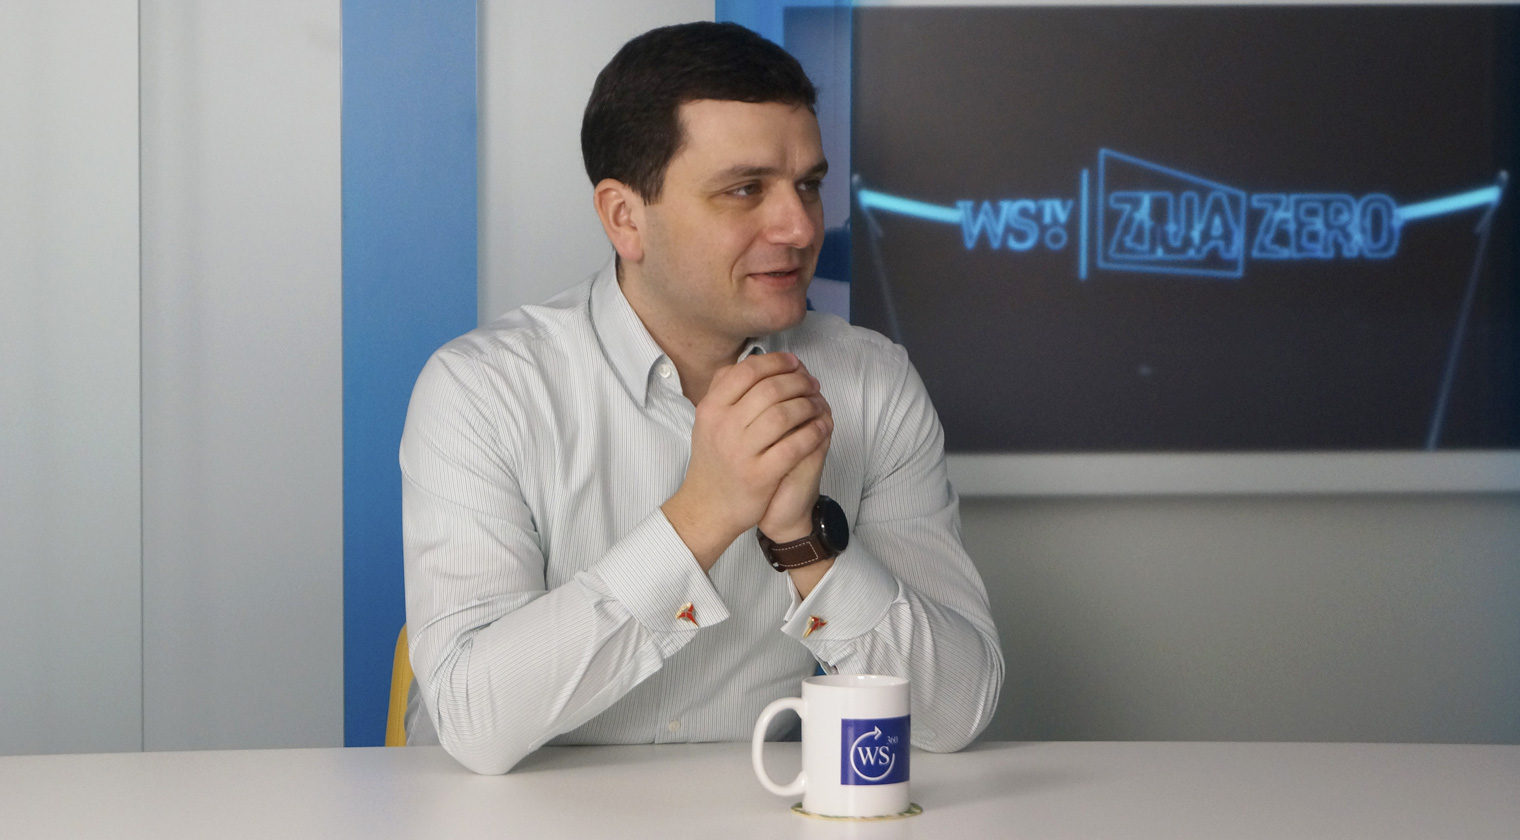 eCommerce - Trei piete noi pentru Zitec dupa investitia de 1,7 milioane de euro de la eMAG